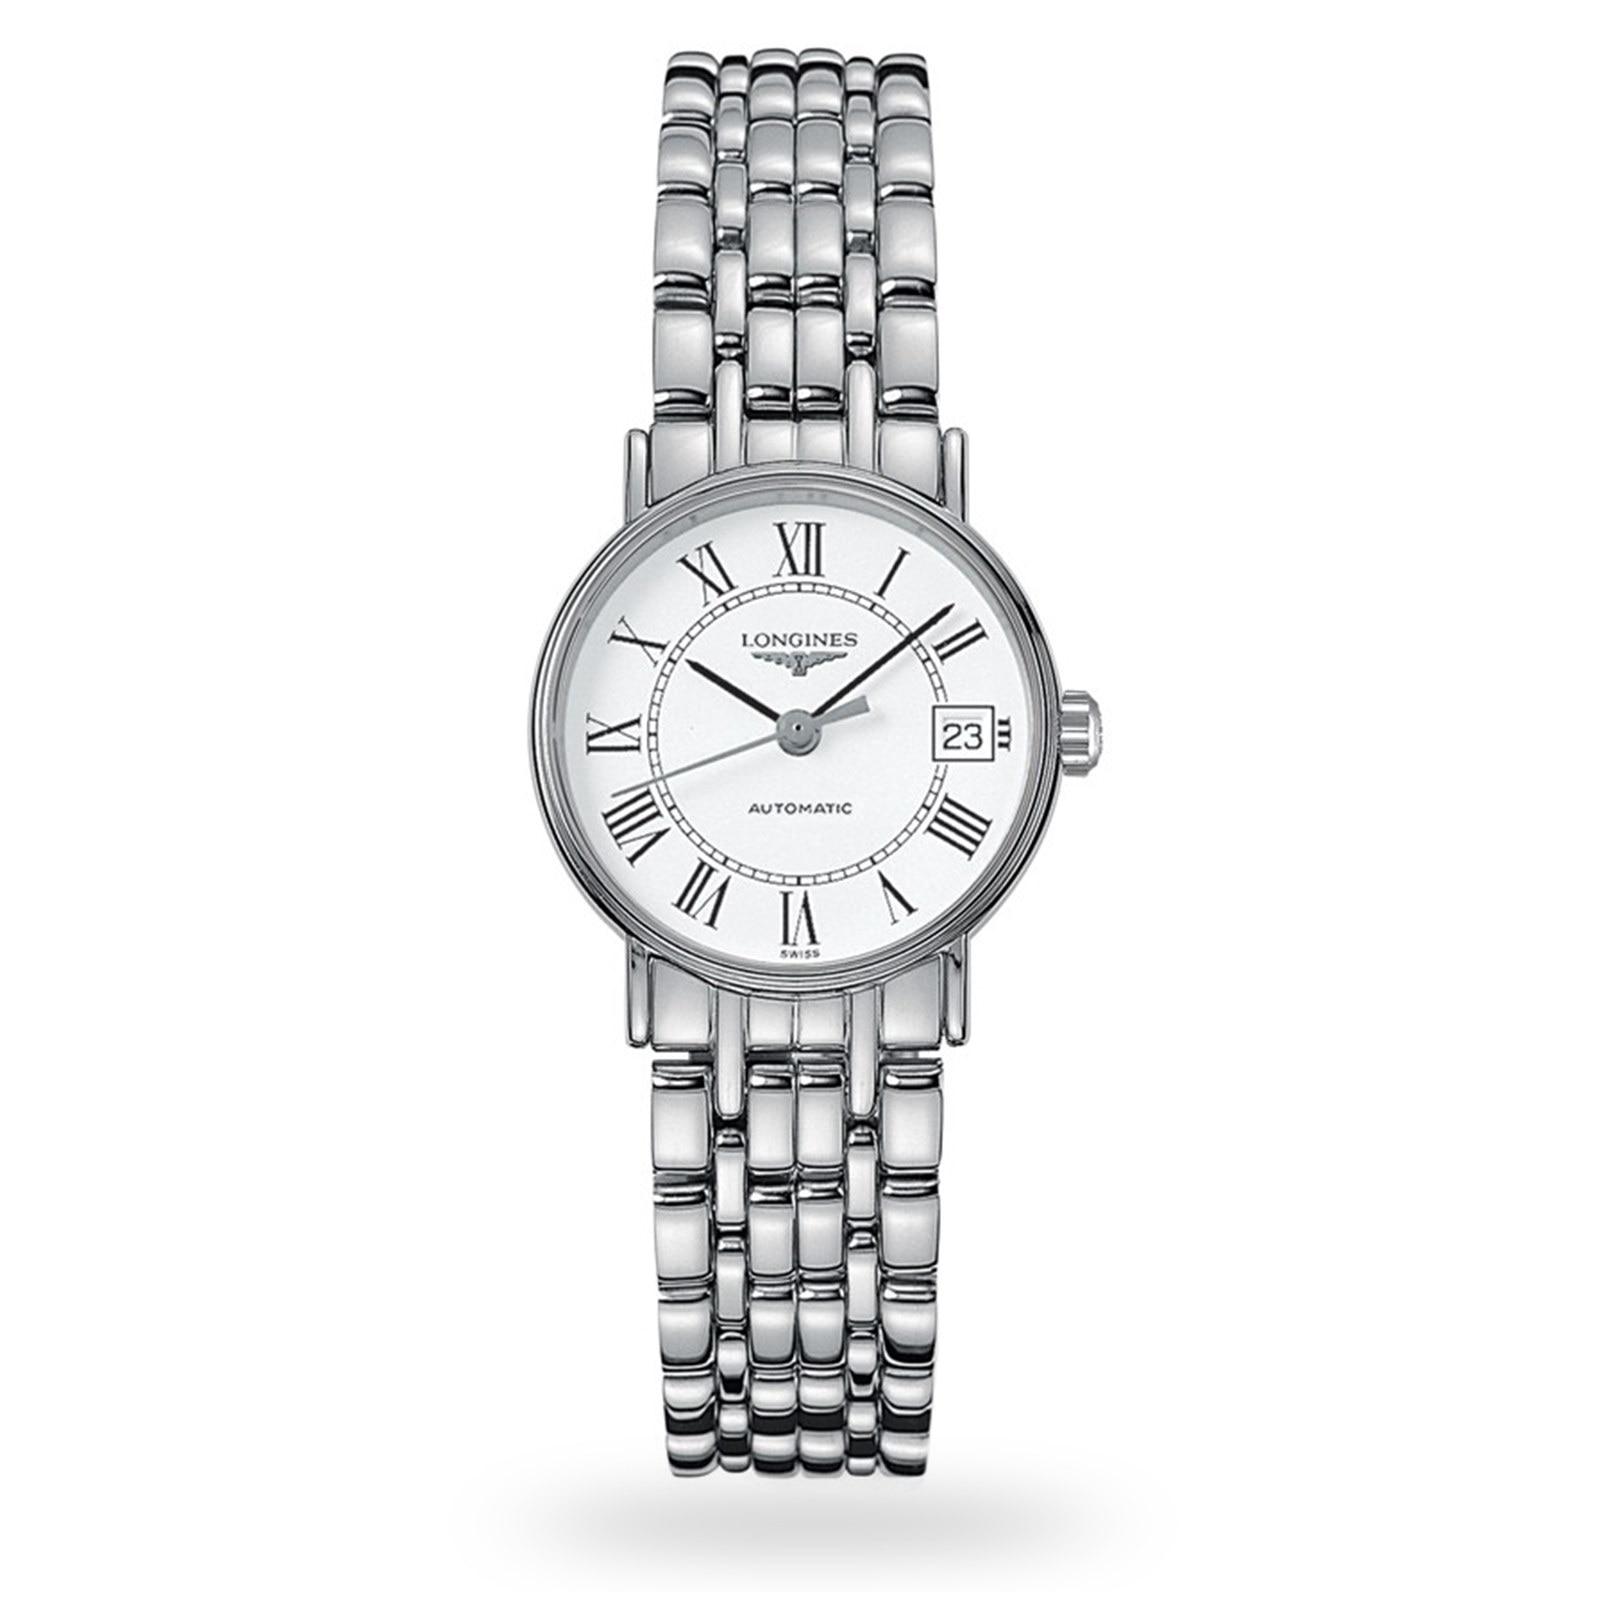 Longines La Grande Classique de Longines 25.5mm Ladies Watch